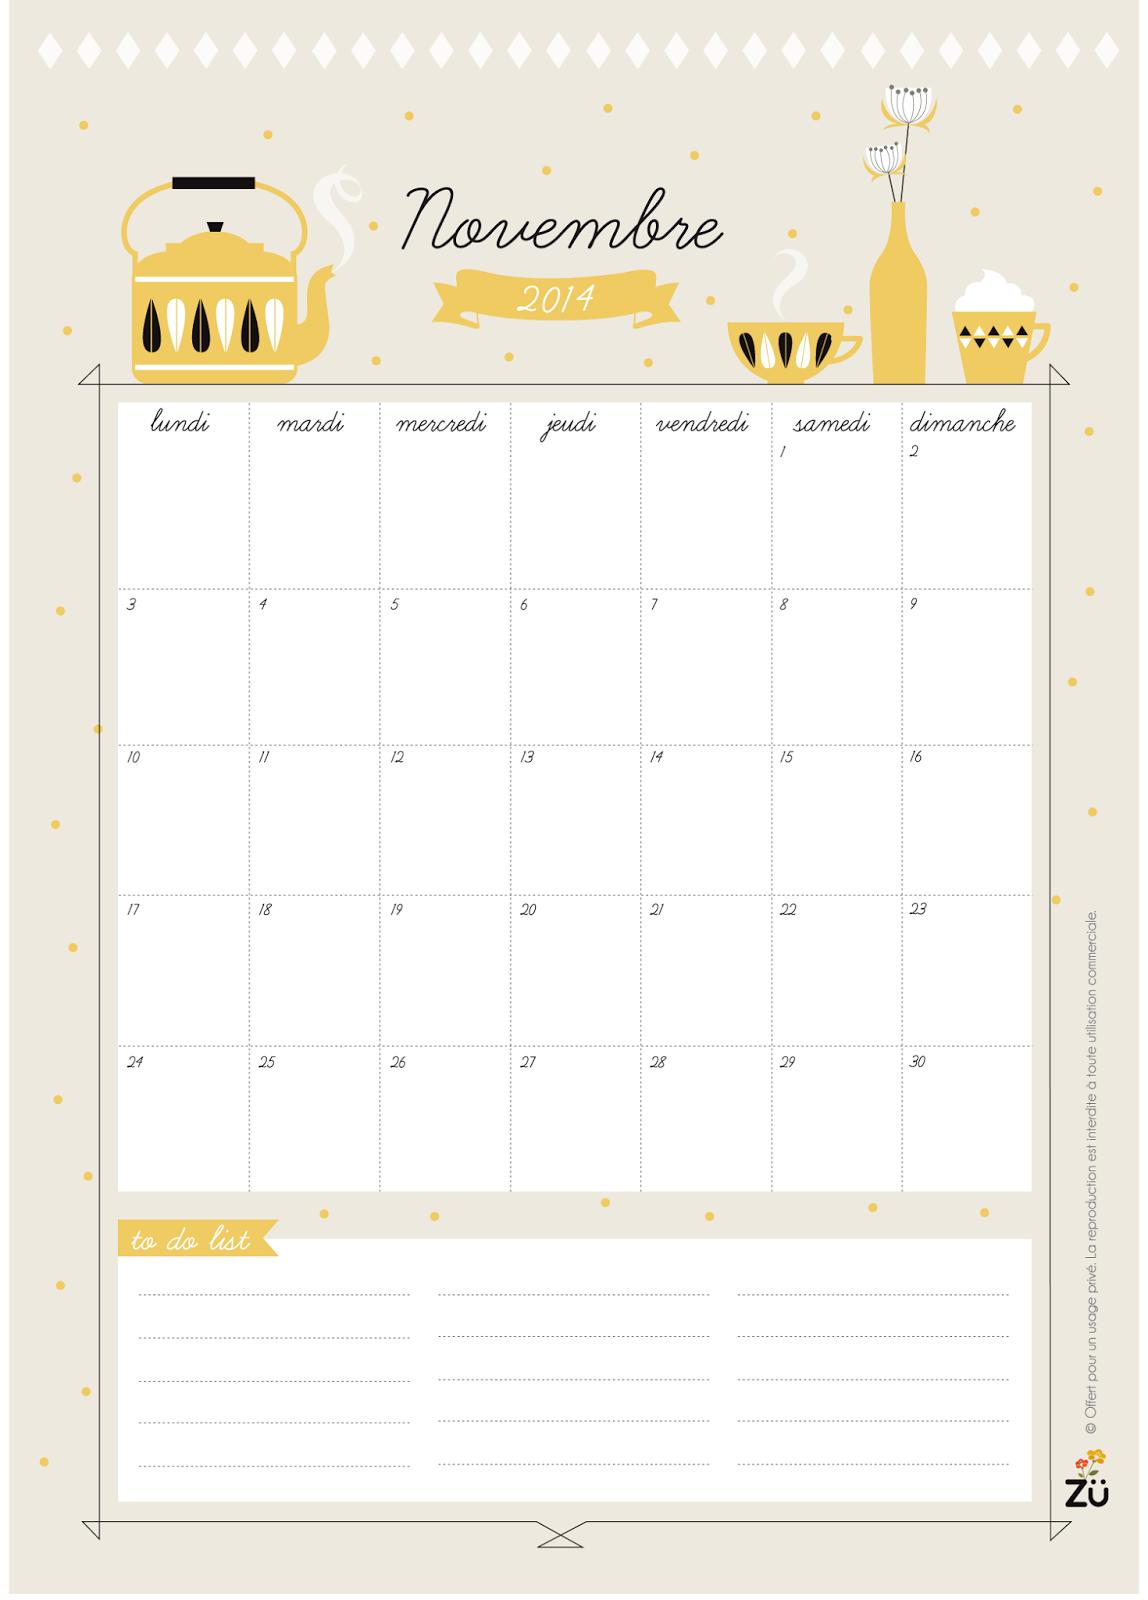 Calendar Zu : Art and chic